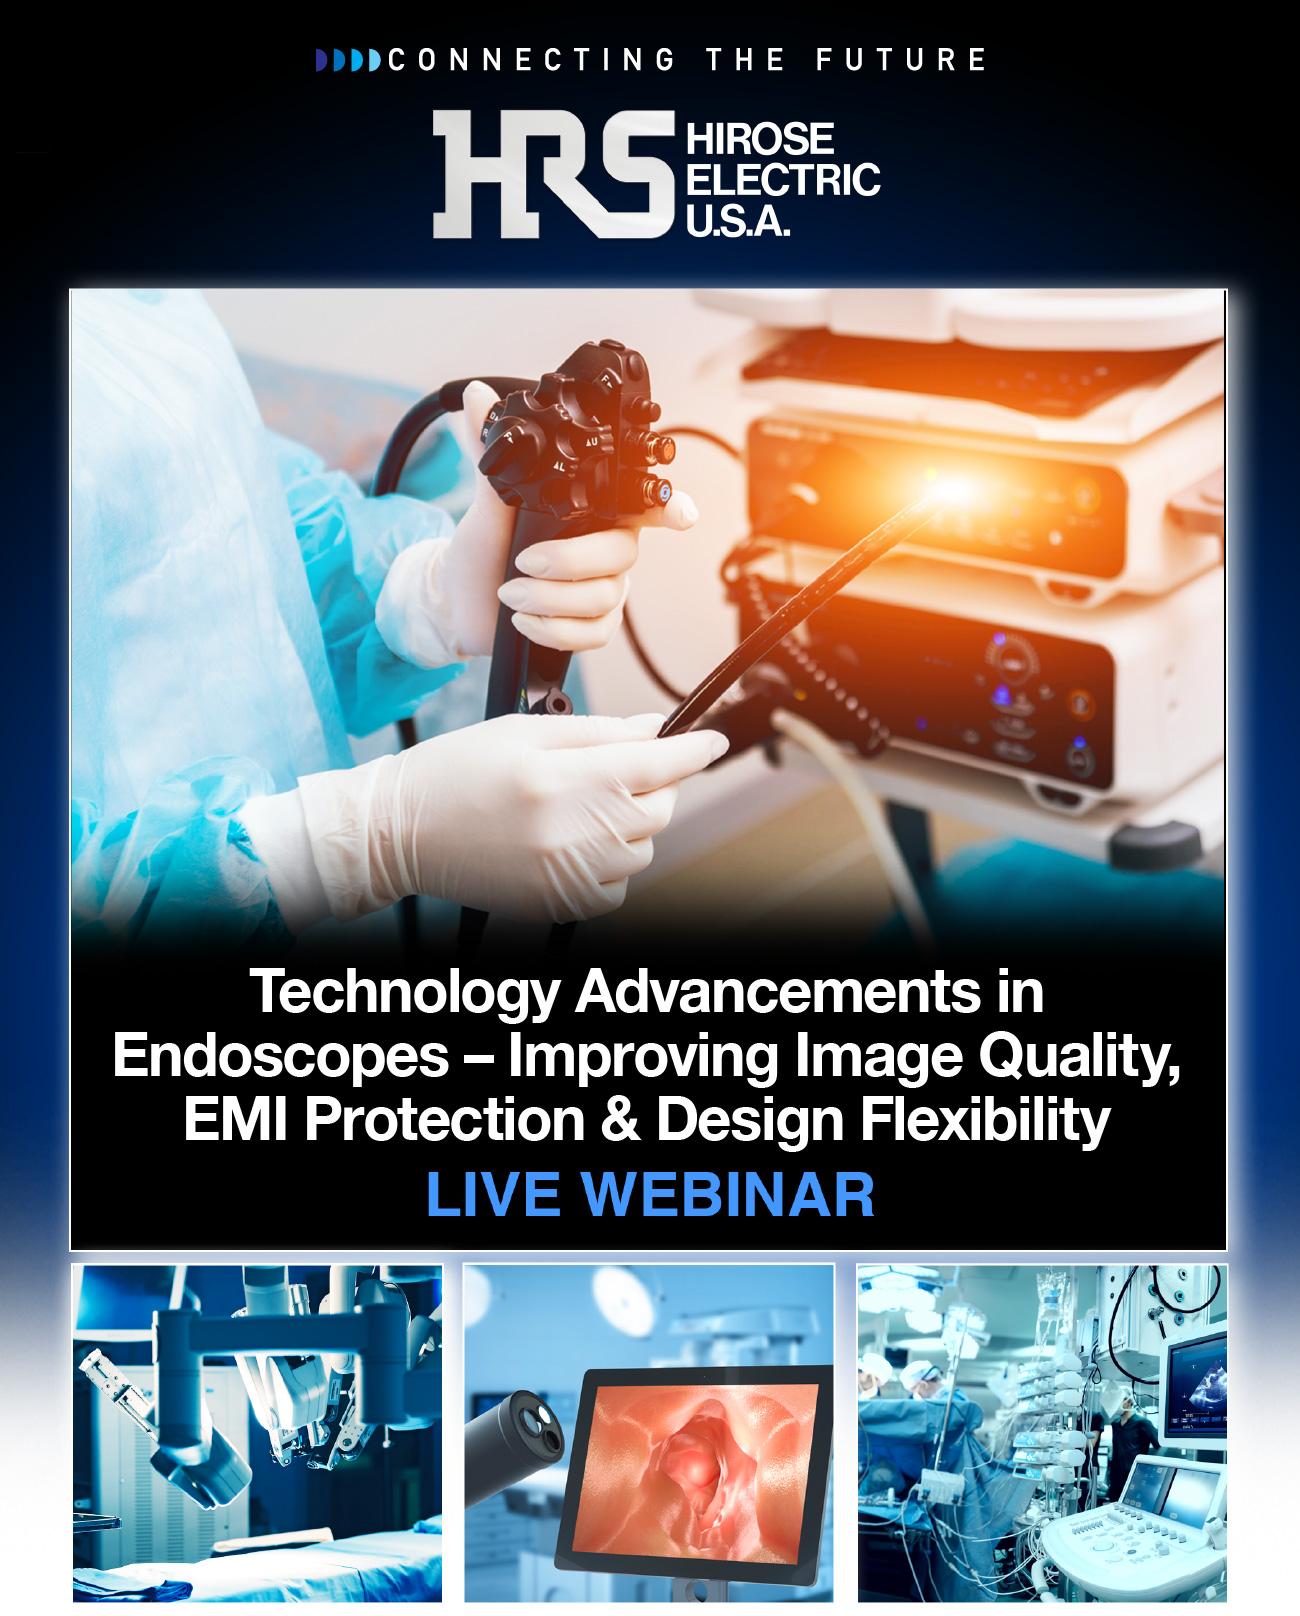 [Live Webinar] Technology Advancements in Endoscopes – Improving Image Quality, EMI Protection & Design Flexibility